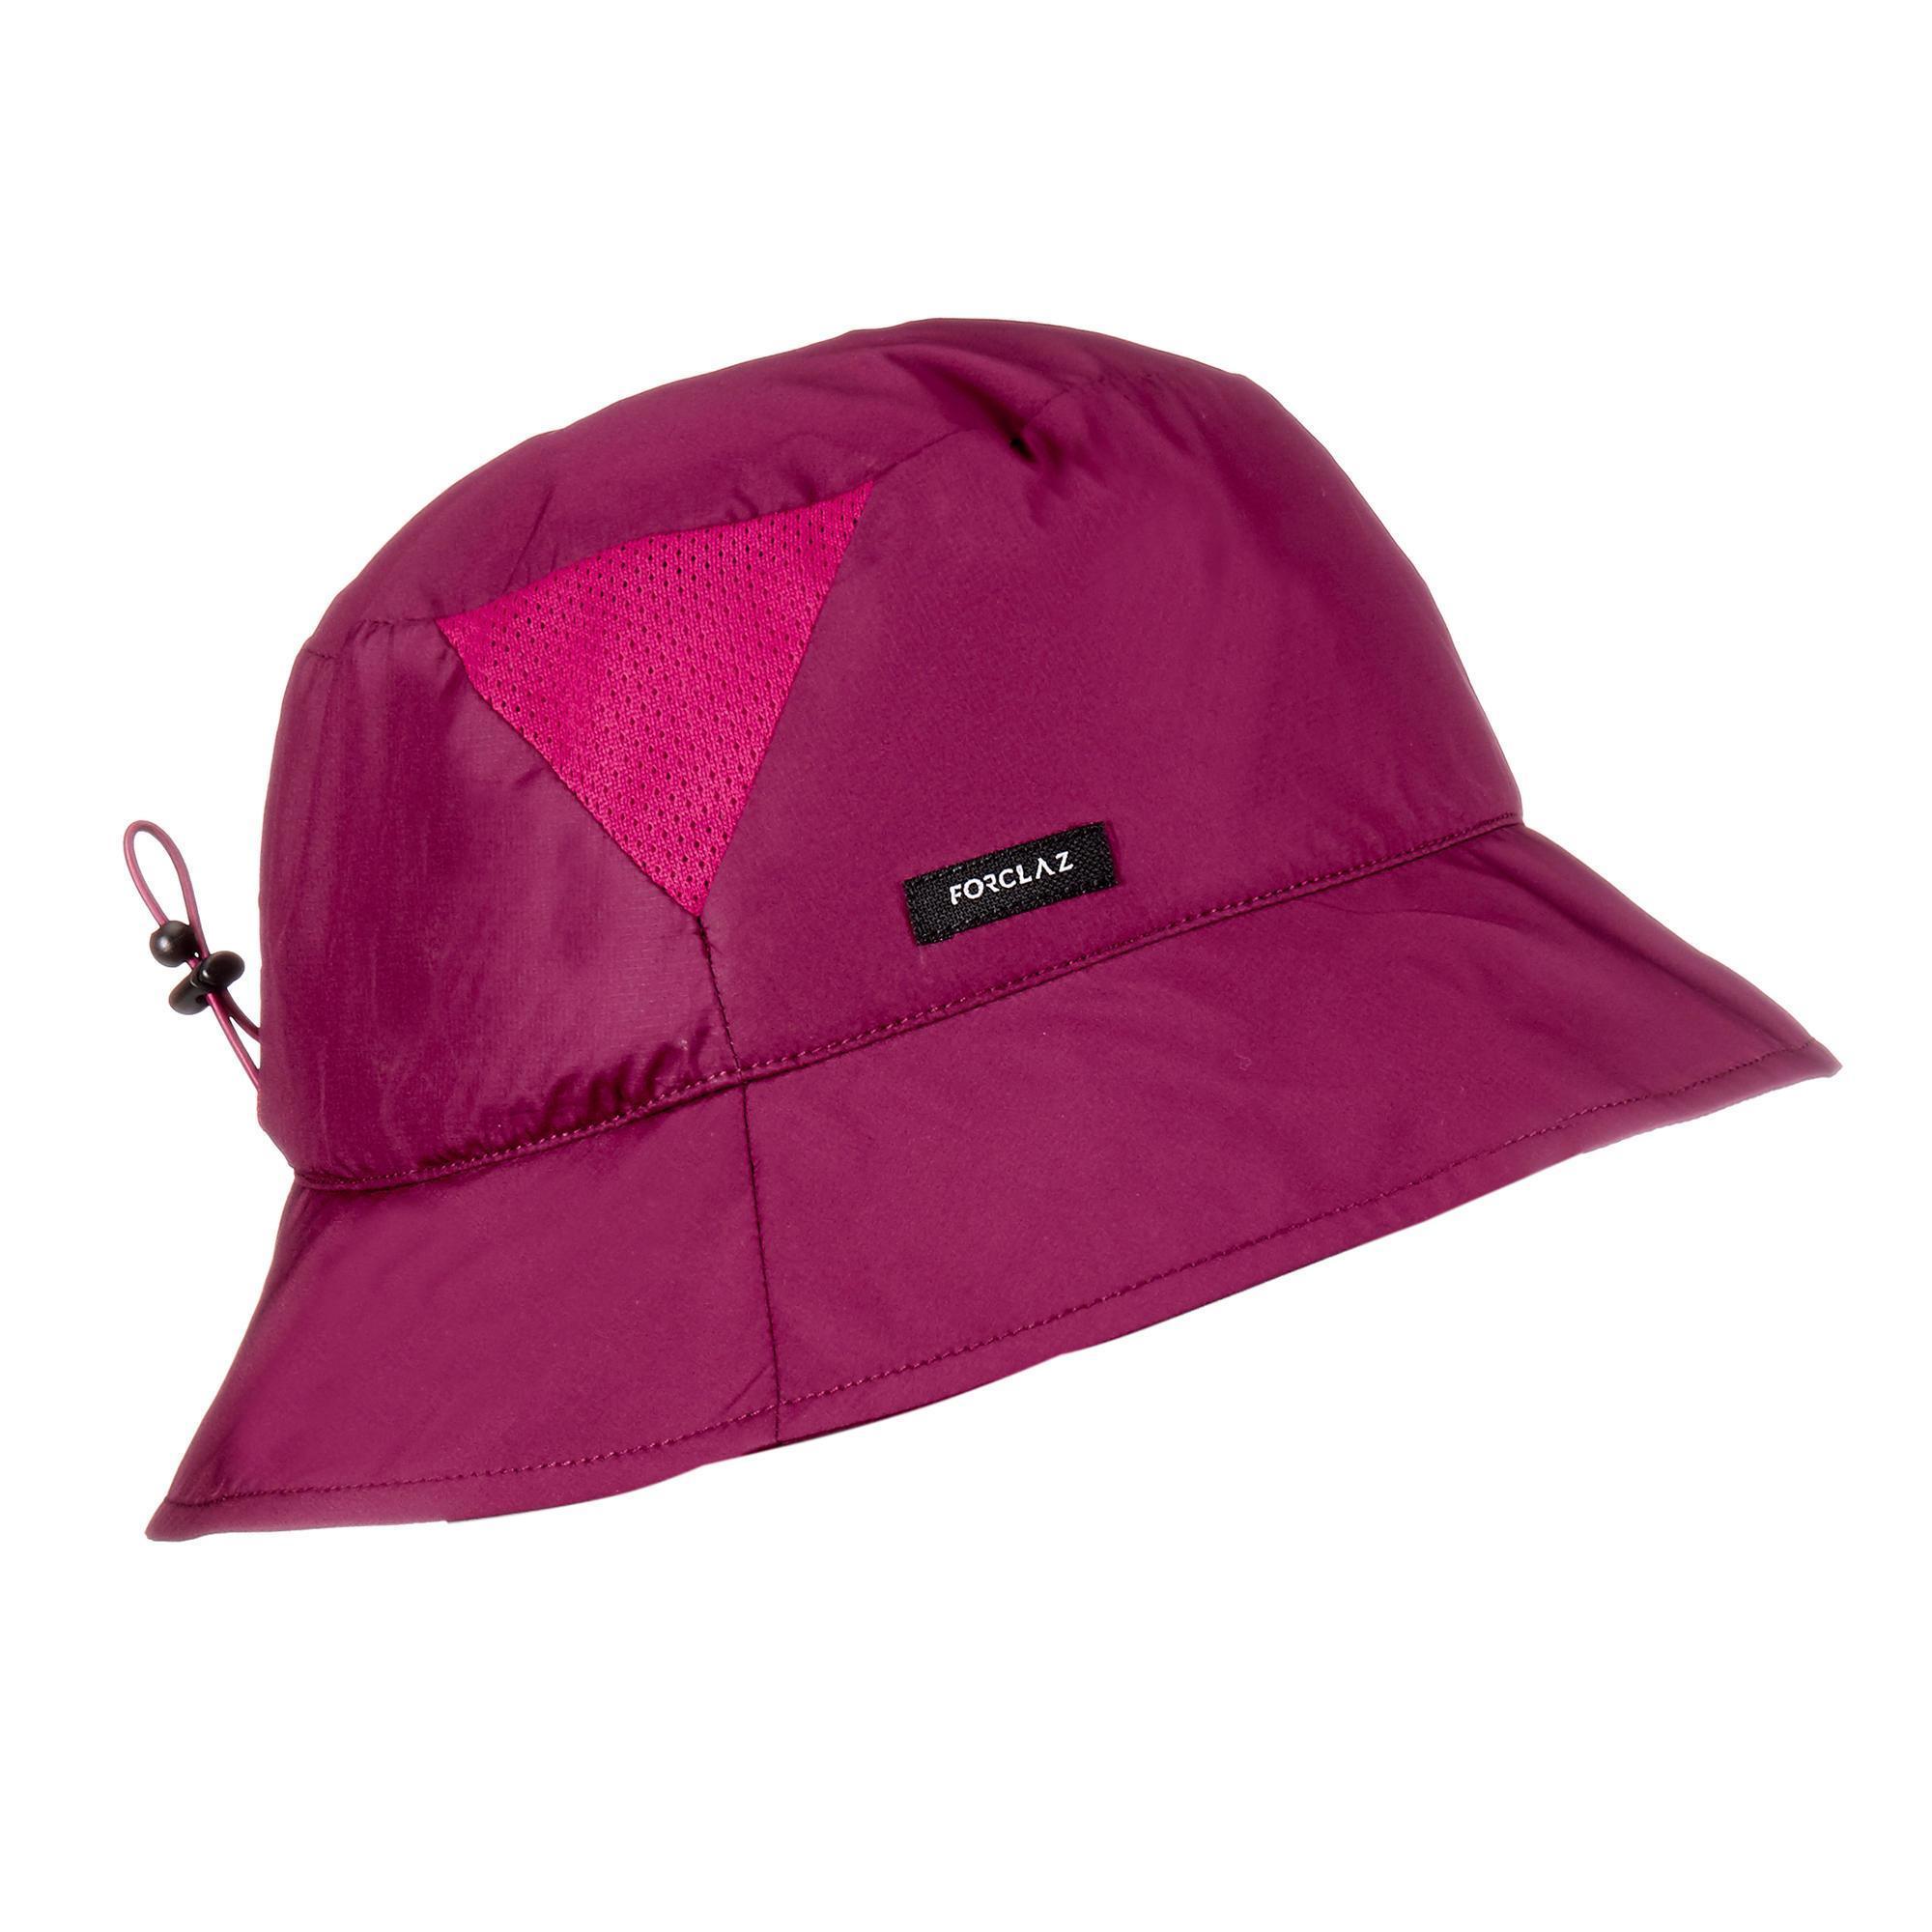 Comprar Sombreros para Deporte  142b0148f70